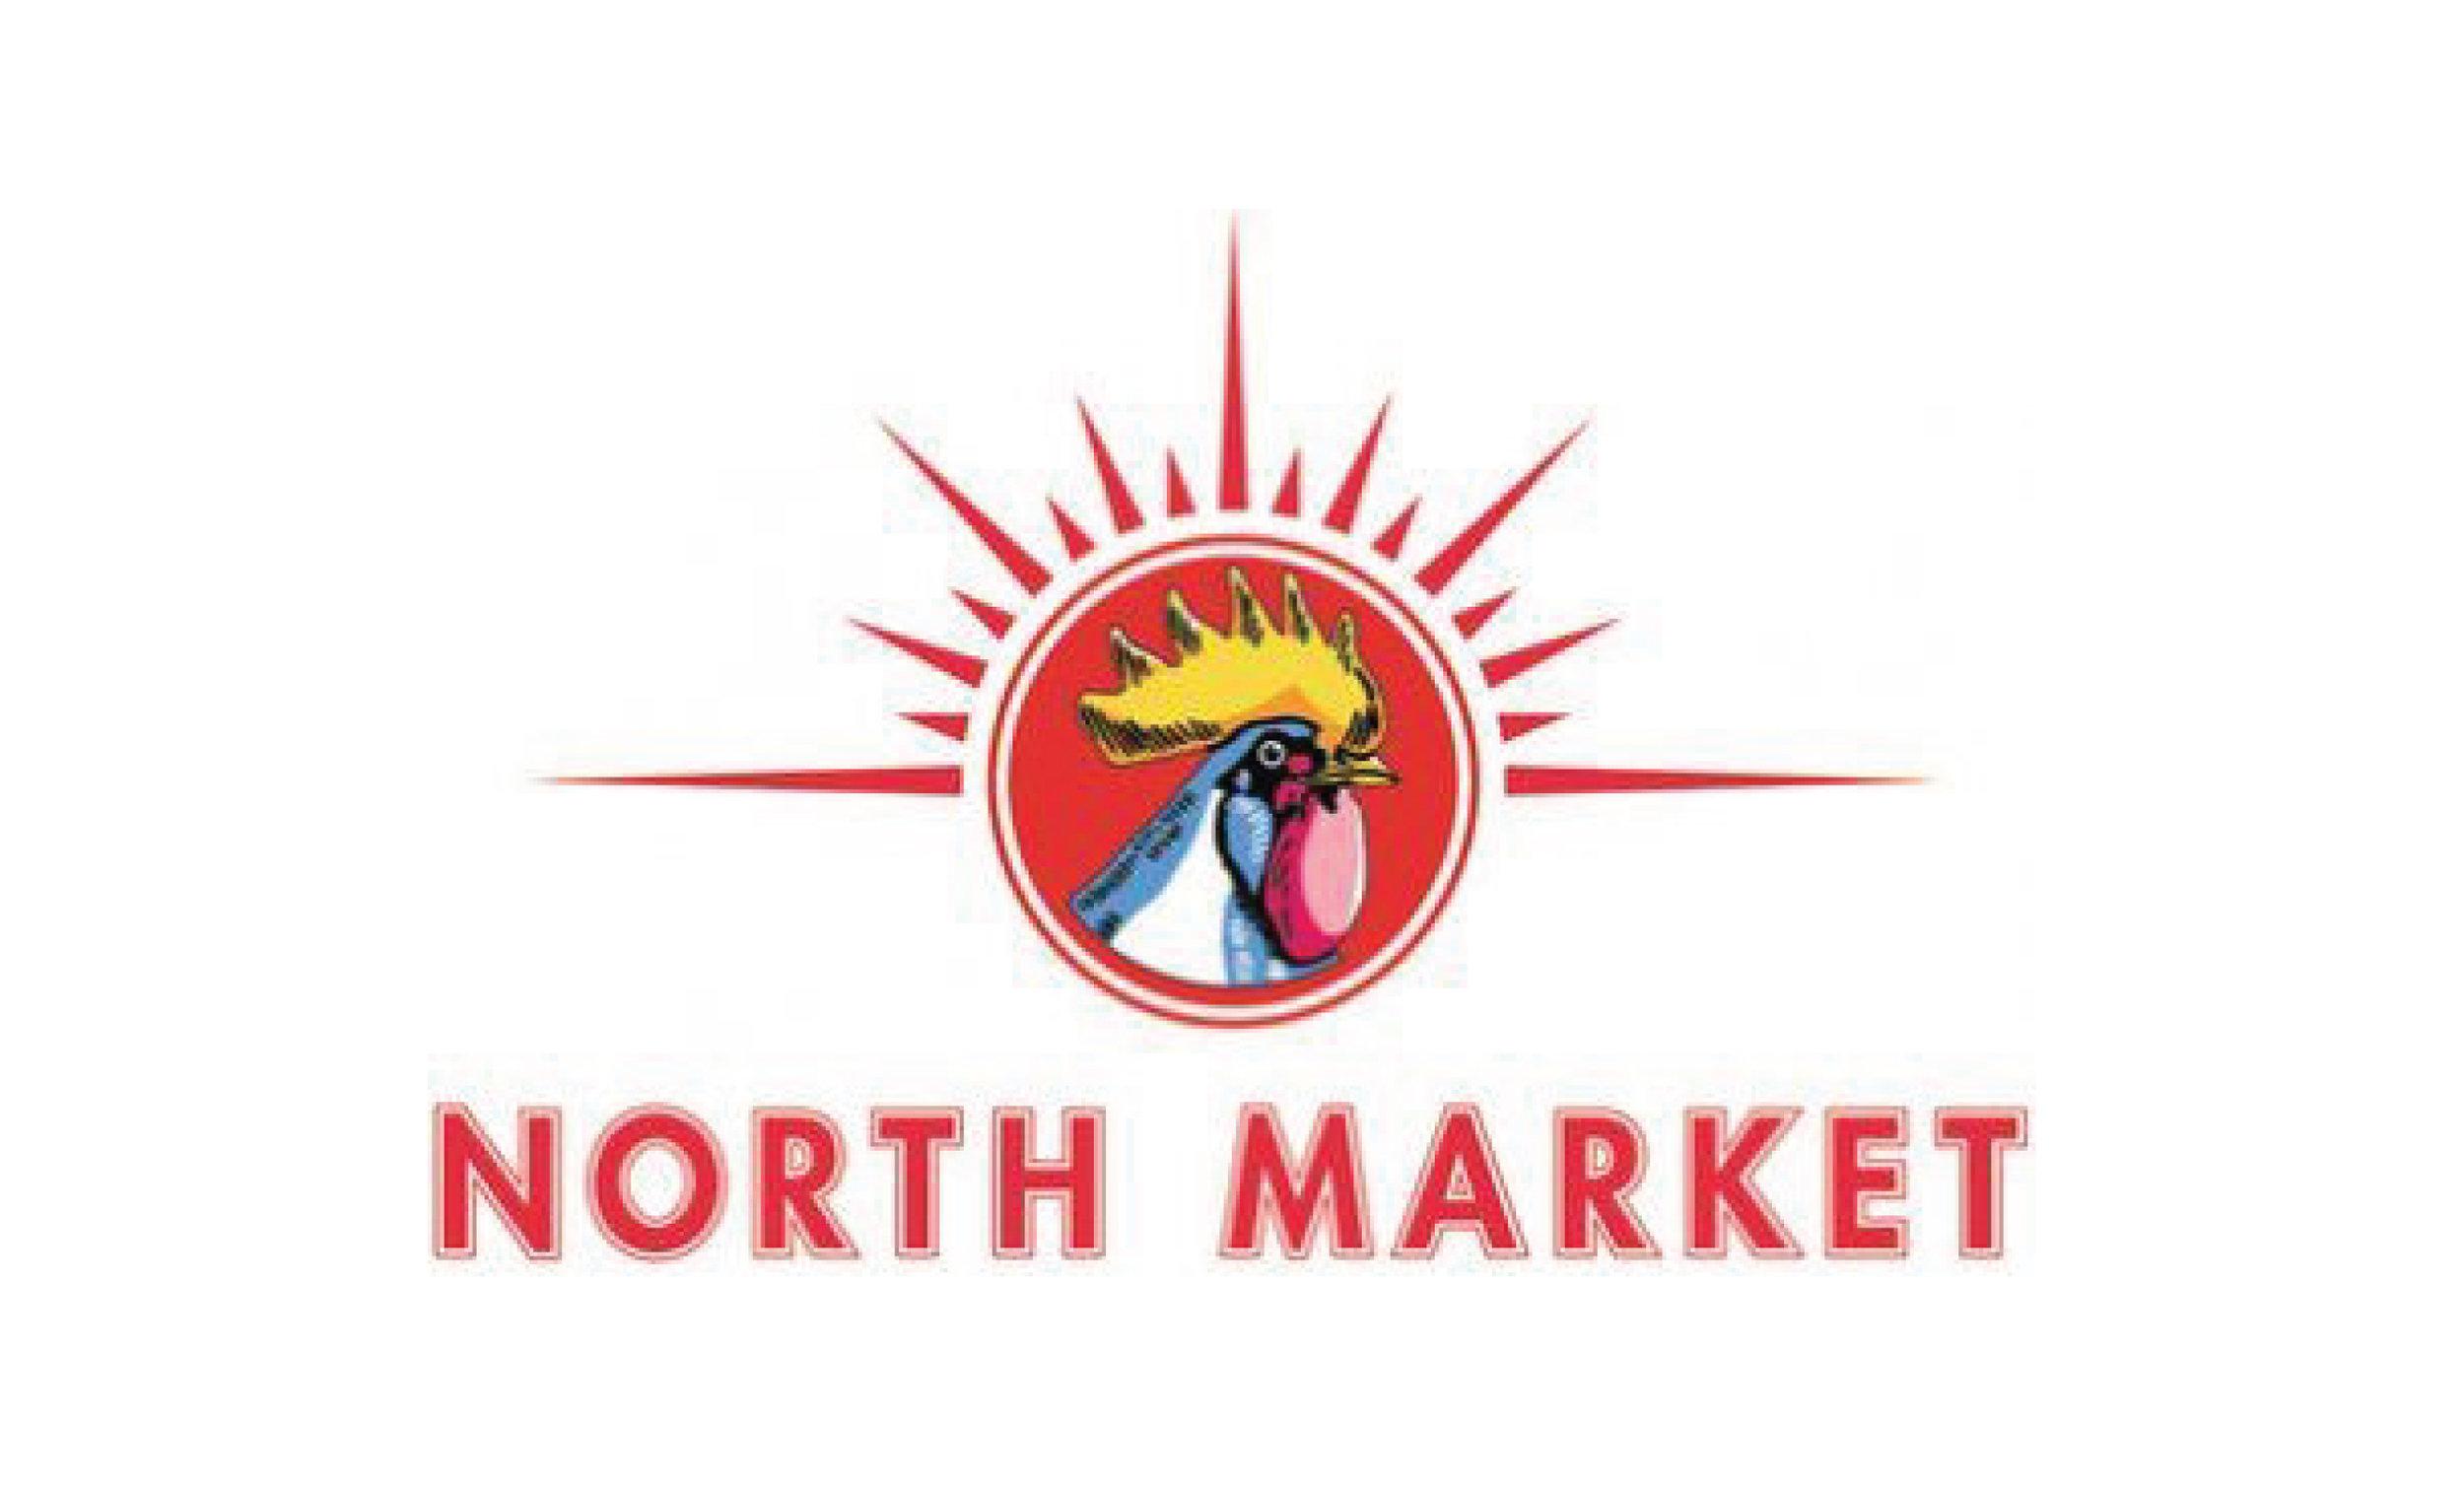 North-Market-01.jpg